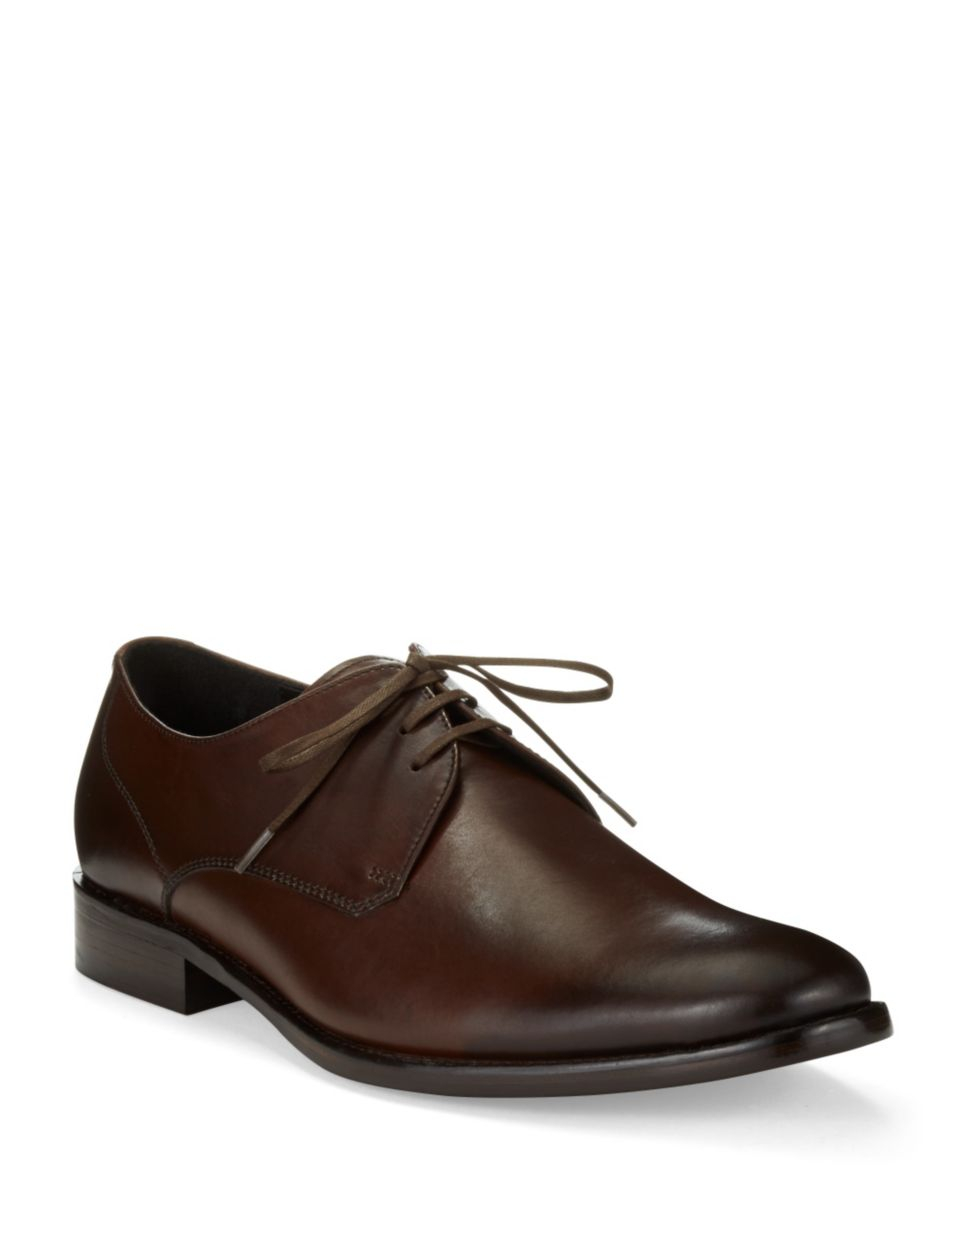 John Varvatos Luxe Derby Dress Shoes